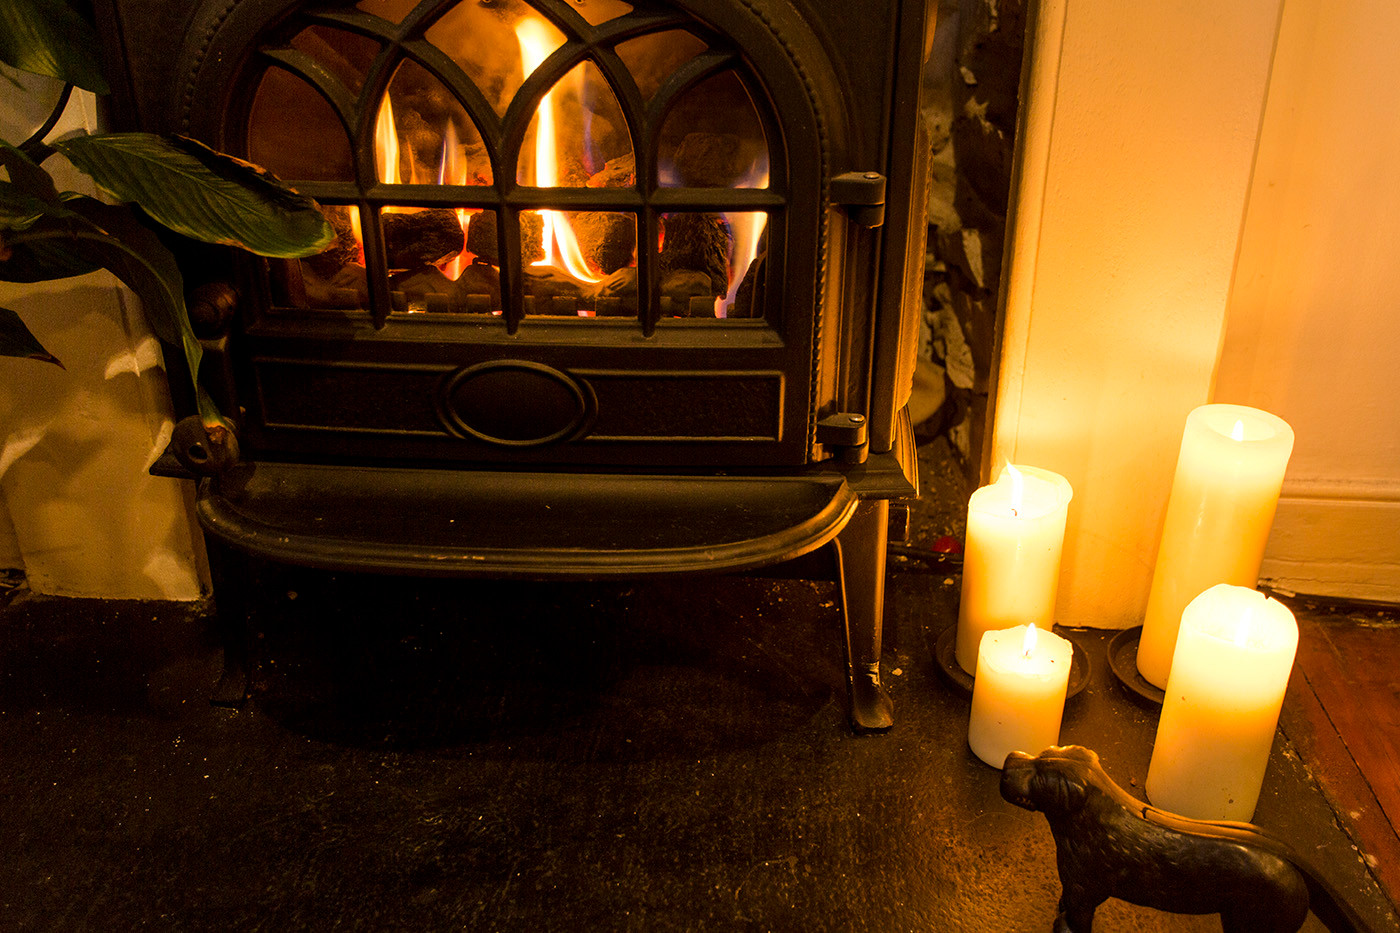 Log burner and candles